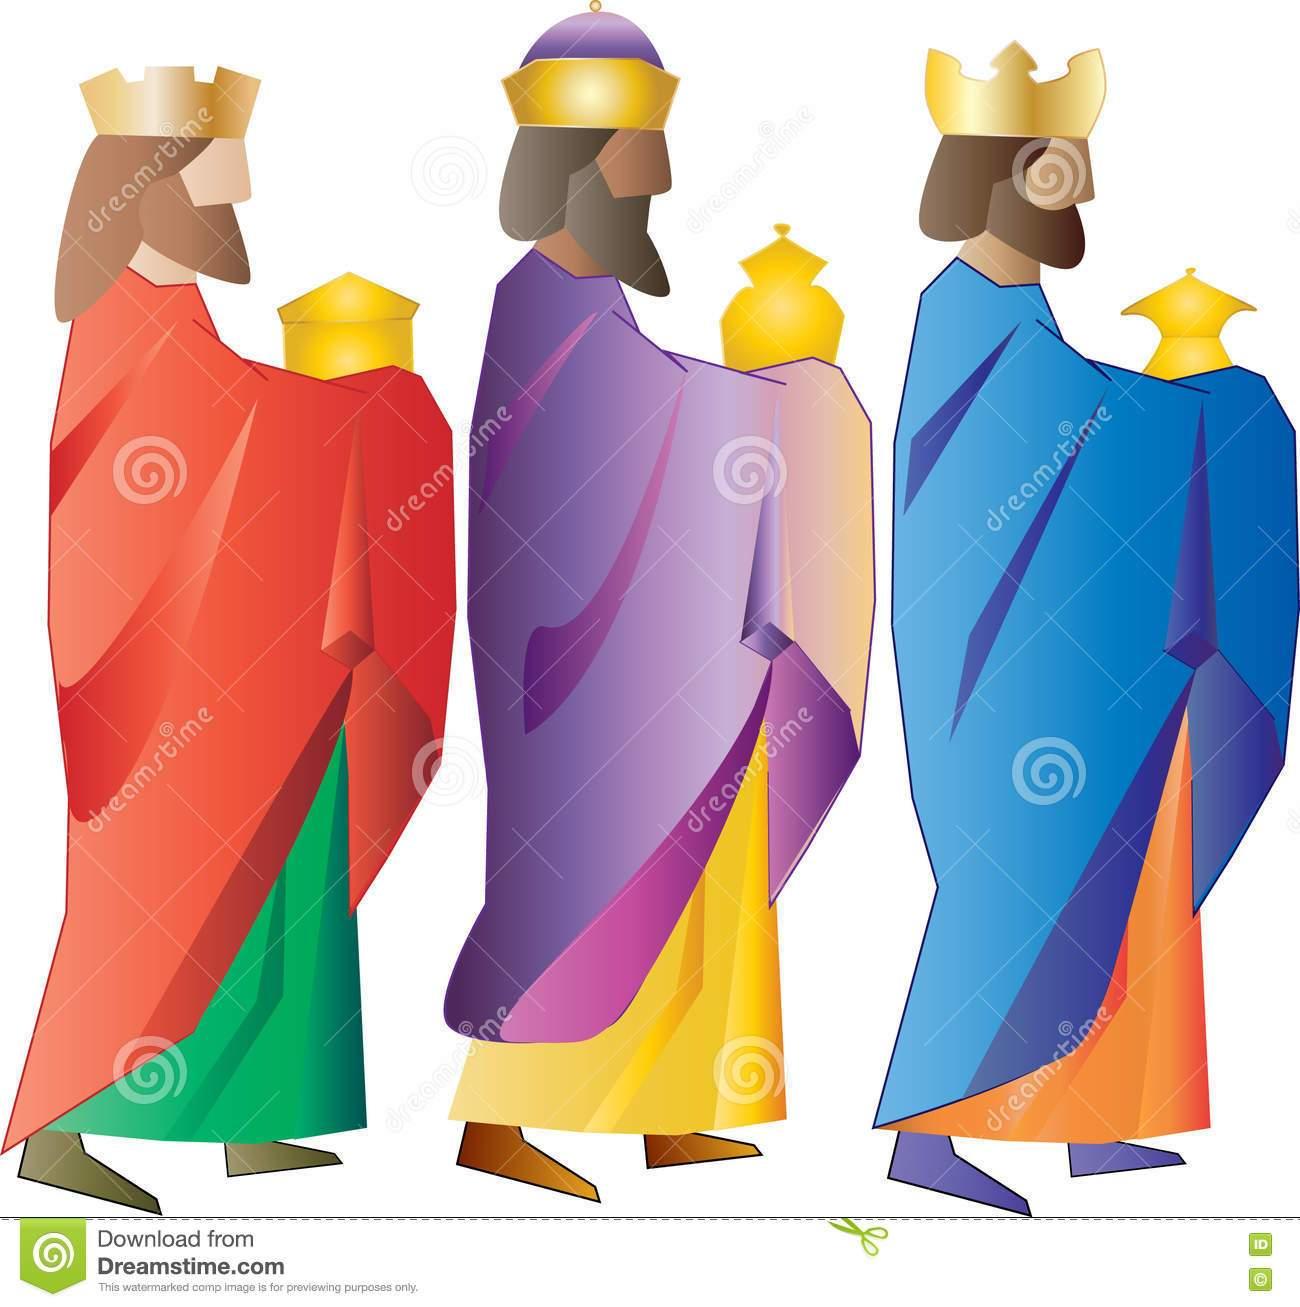 Three kings clipart free 1 » Clipart Portal.